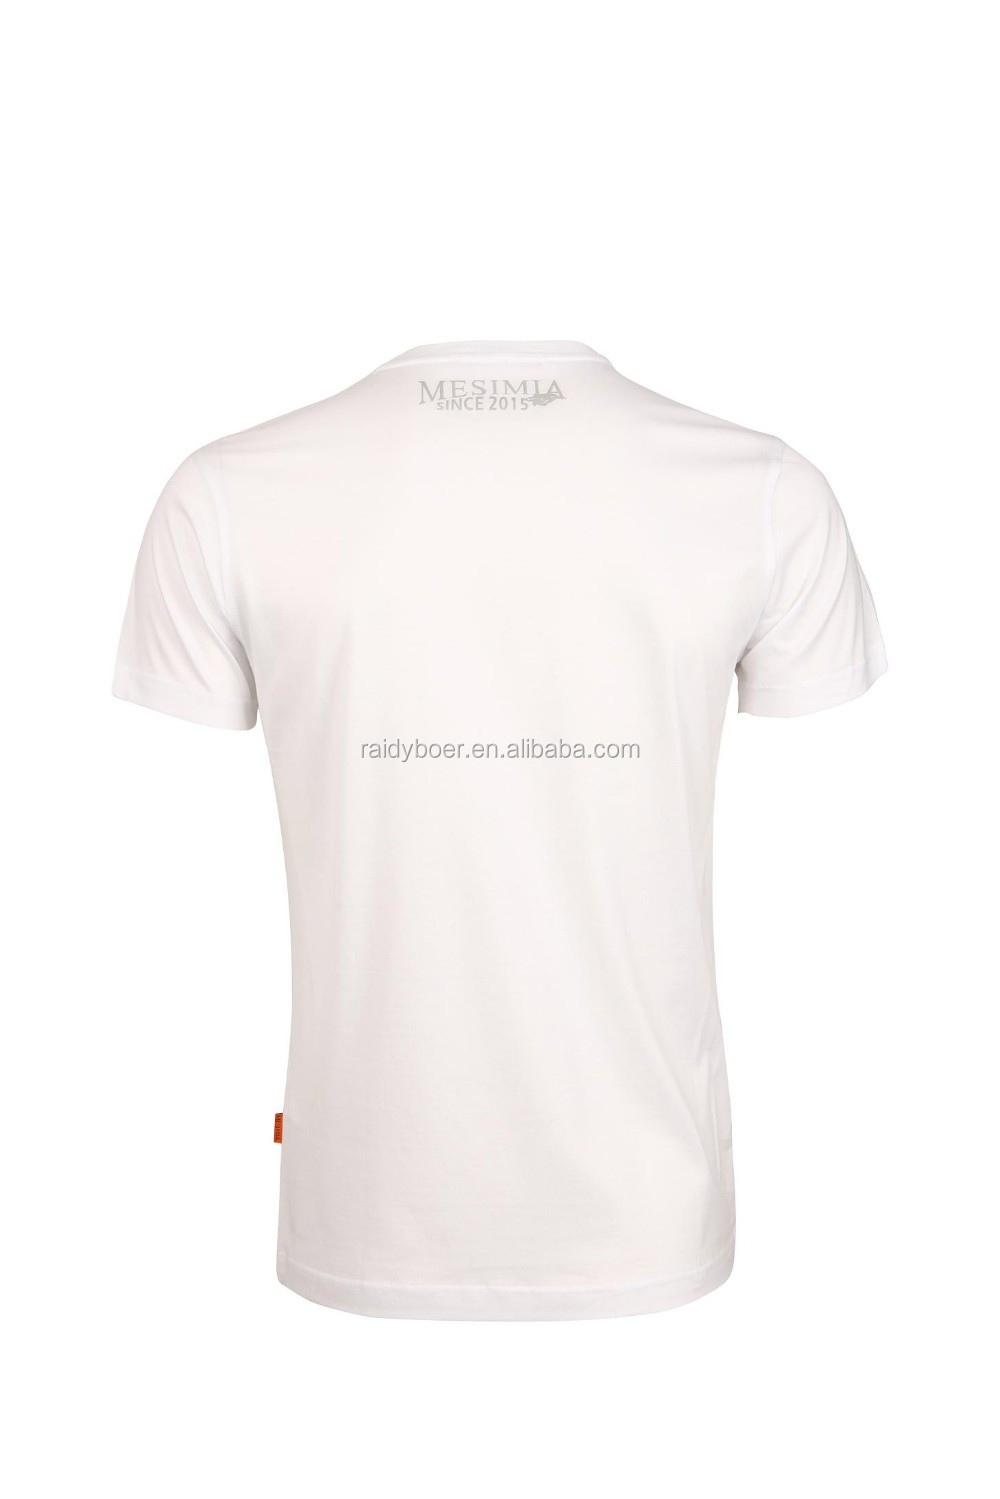 100 Cotton Wholesale Stock T Shirts Buy Stock T Shirts